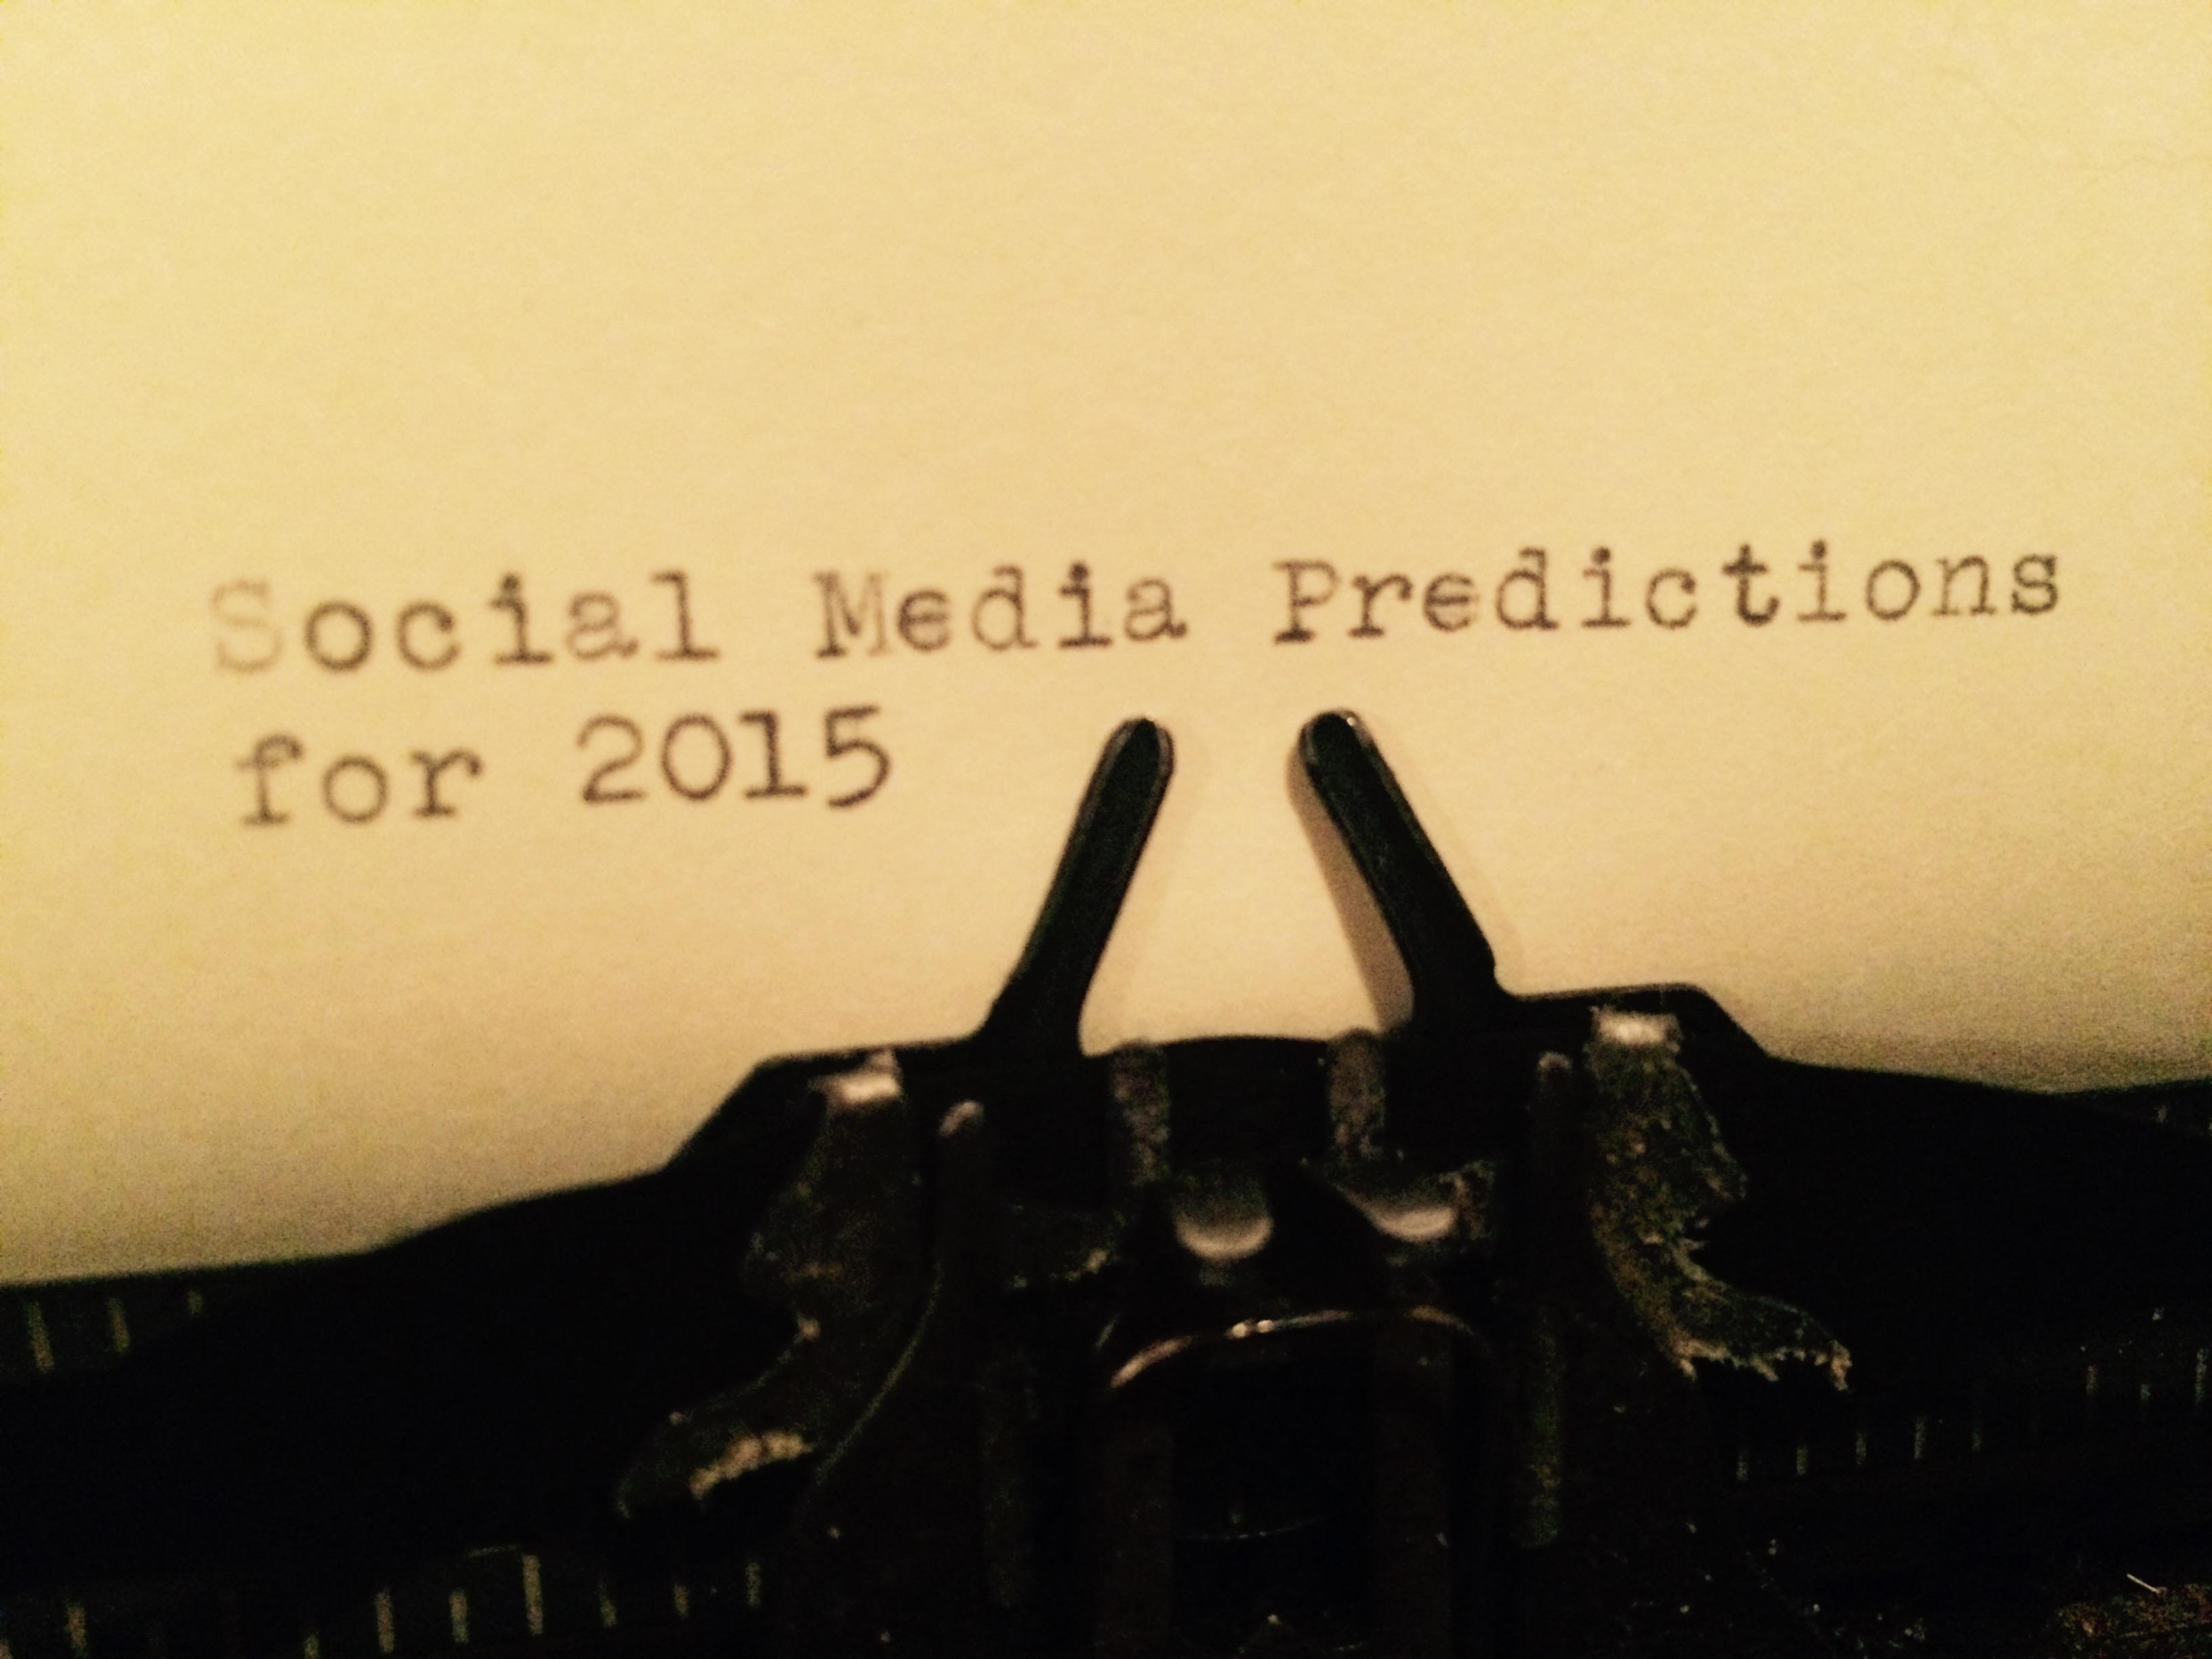 social media predictions, 2015, social media tips, how to use social media, blog, jamesrcsmith, james r.c. smith, james smith